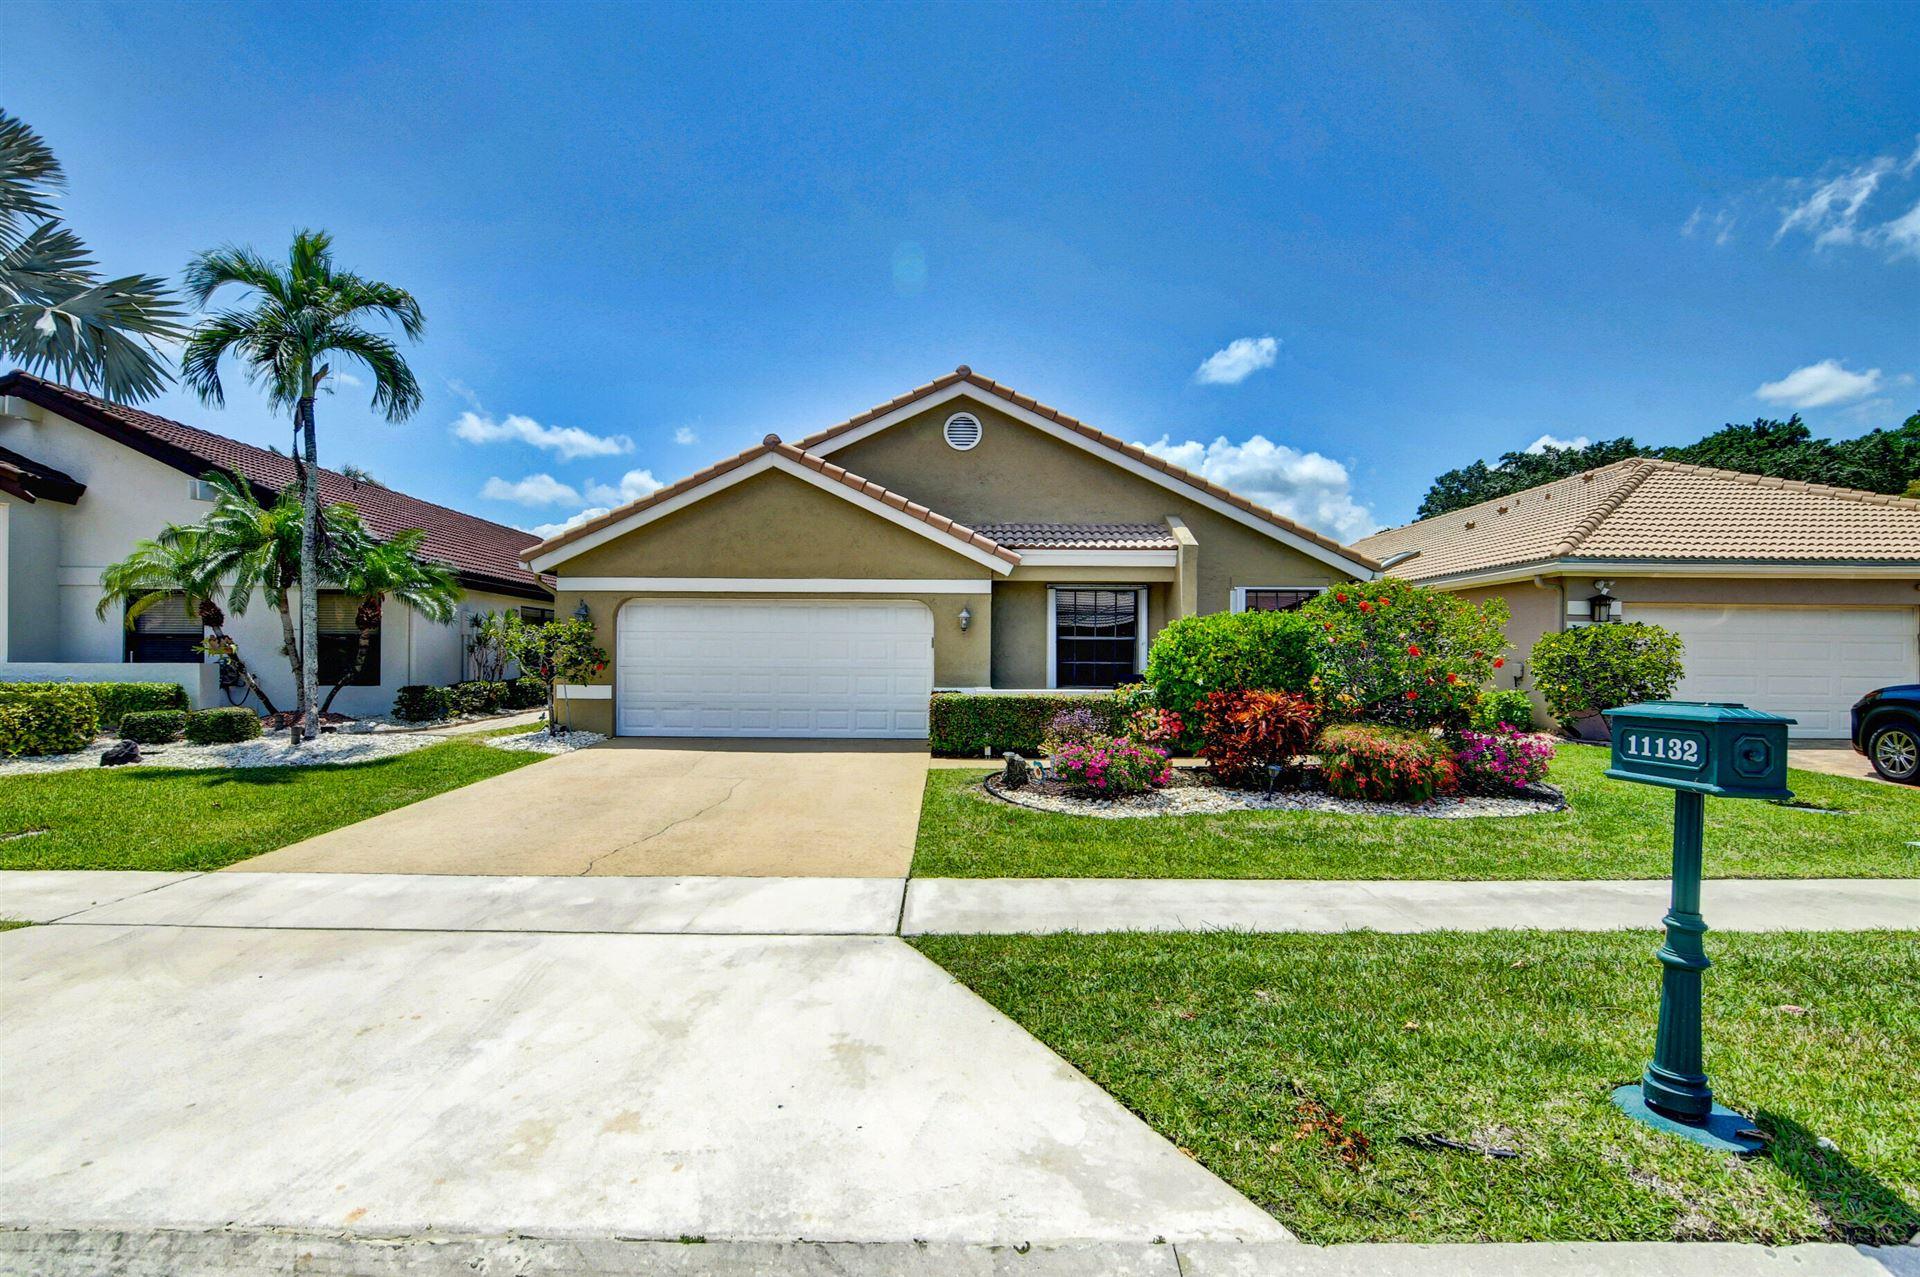 11132 Clover Leaf Circle, Boca Raton, FL 33428 - MLS#: RX-10720364